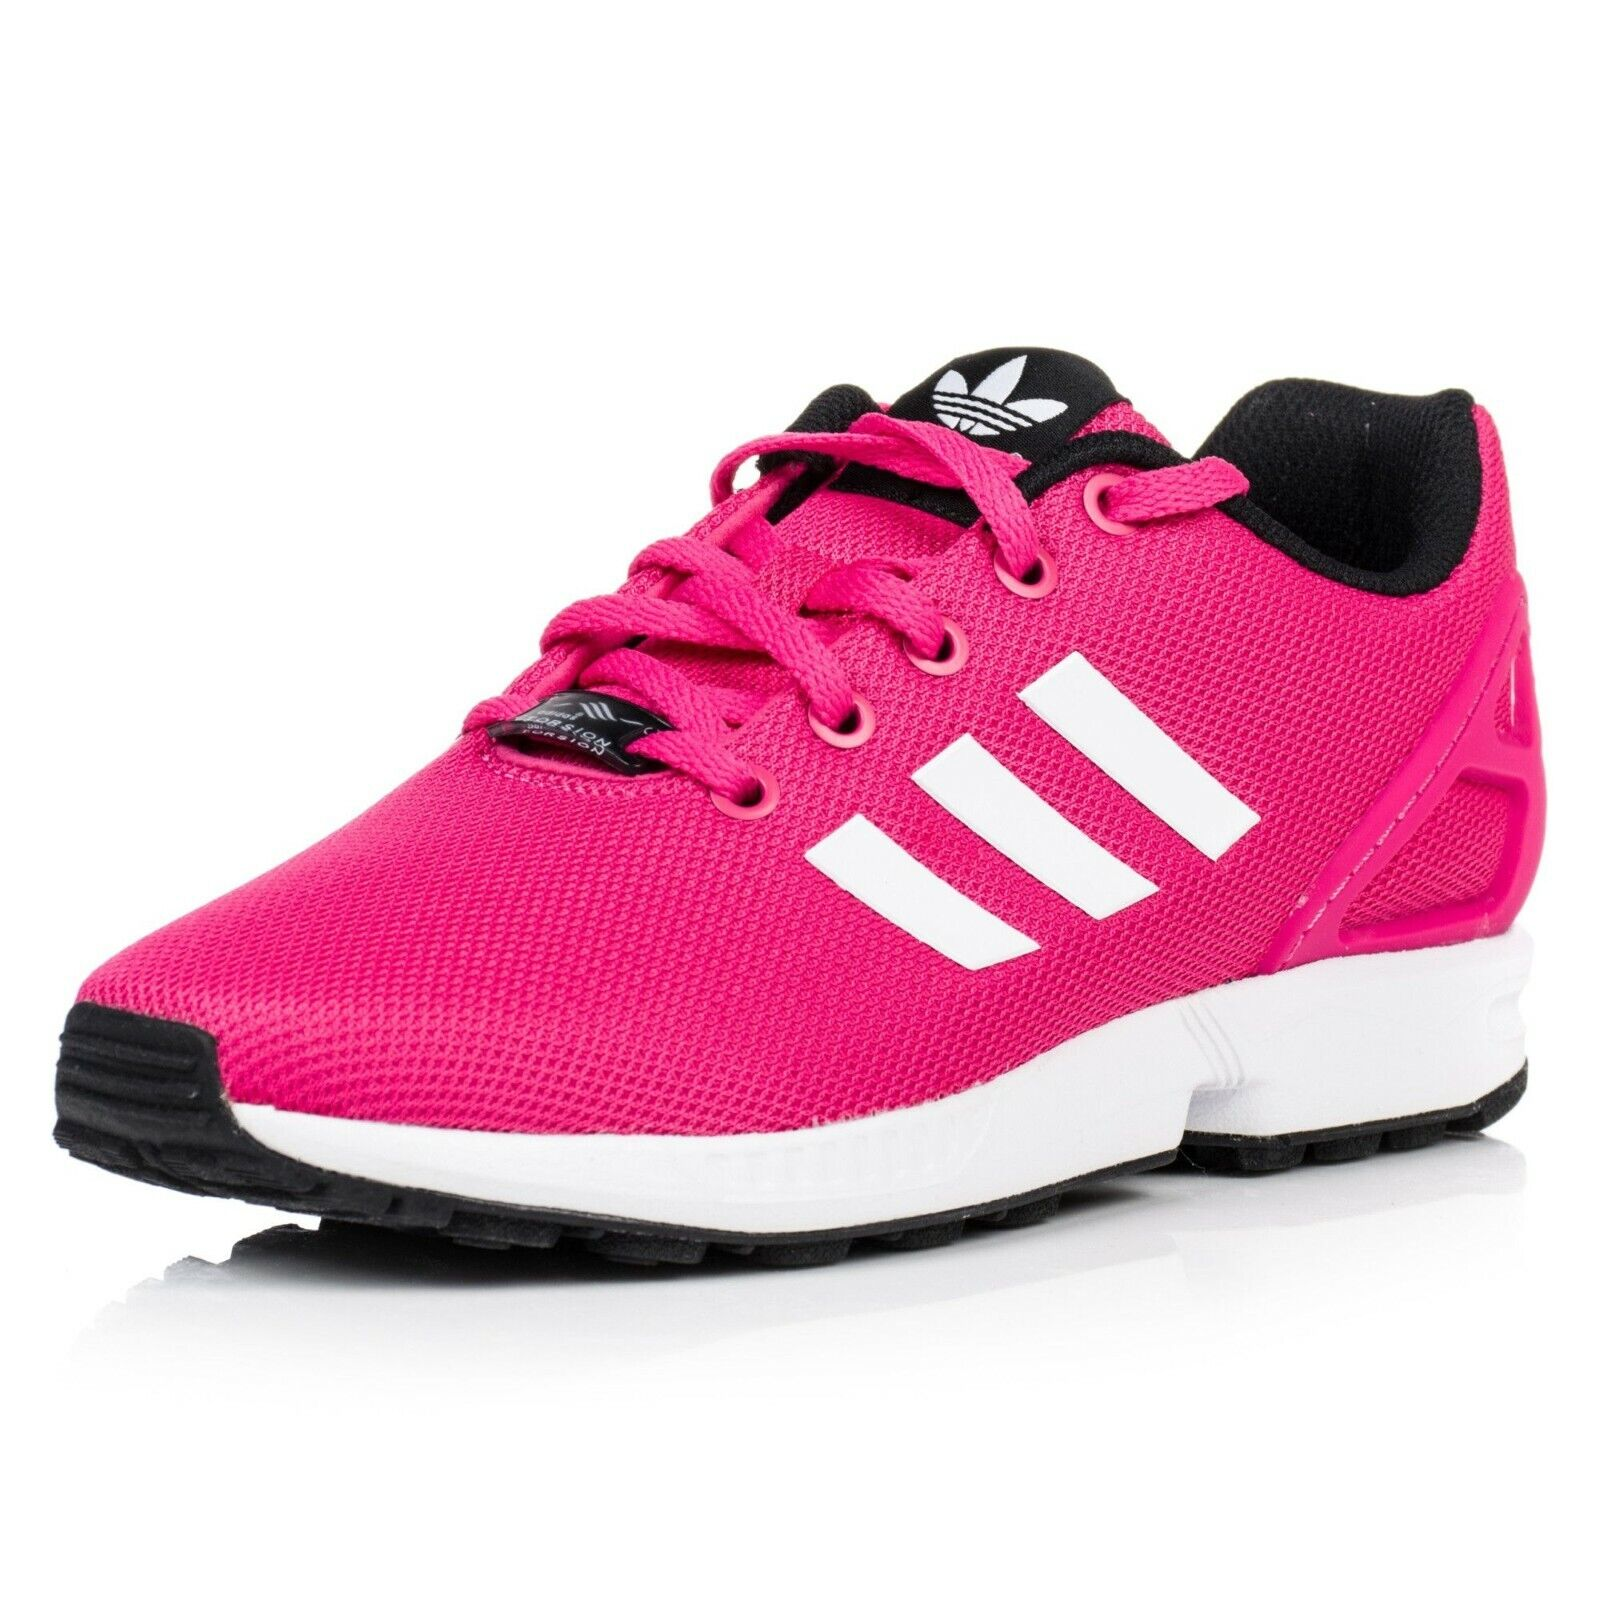 adidas springblade rosa neon